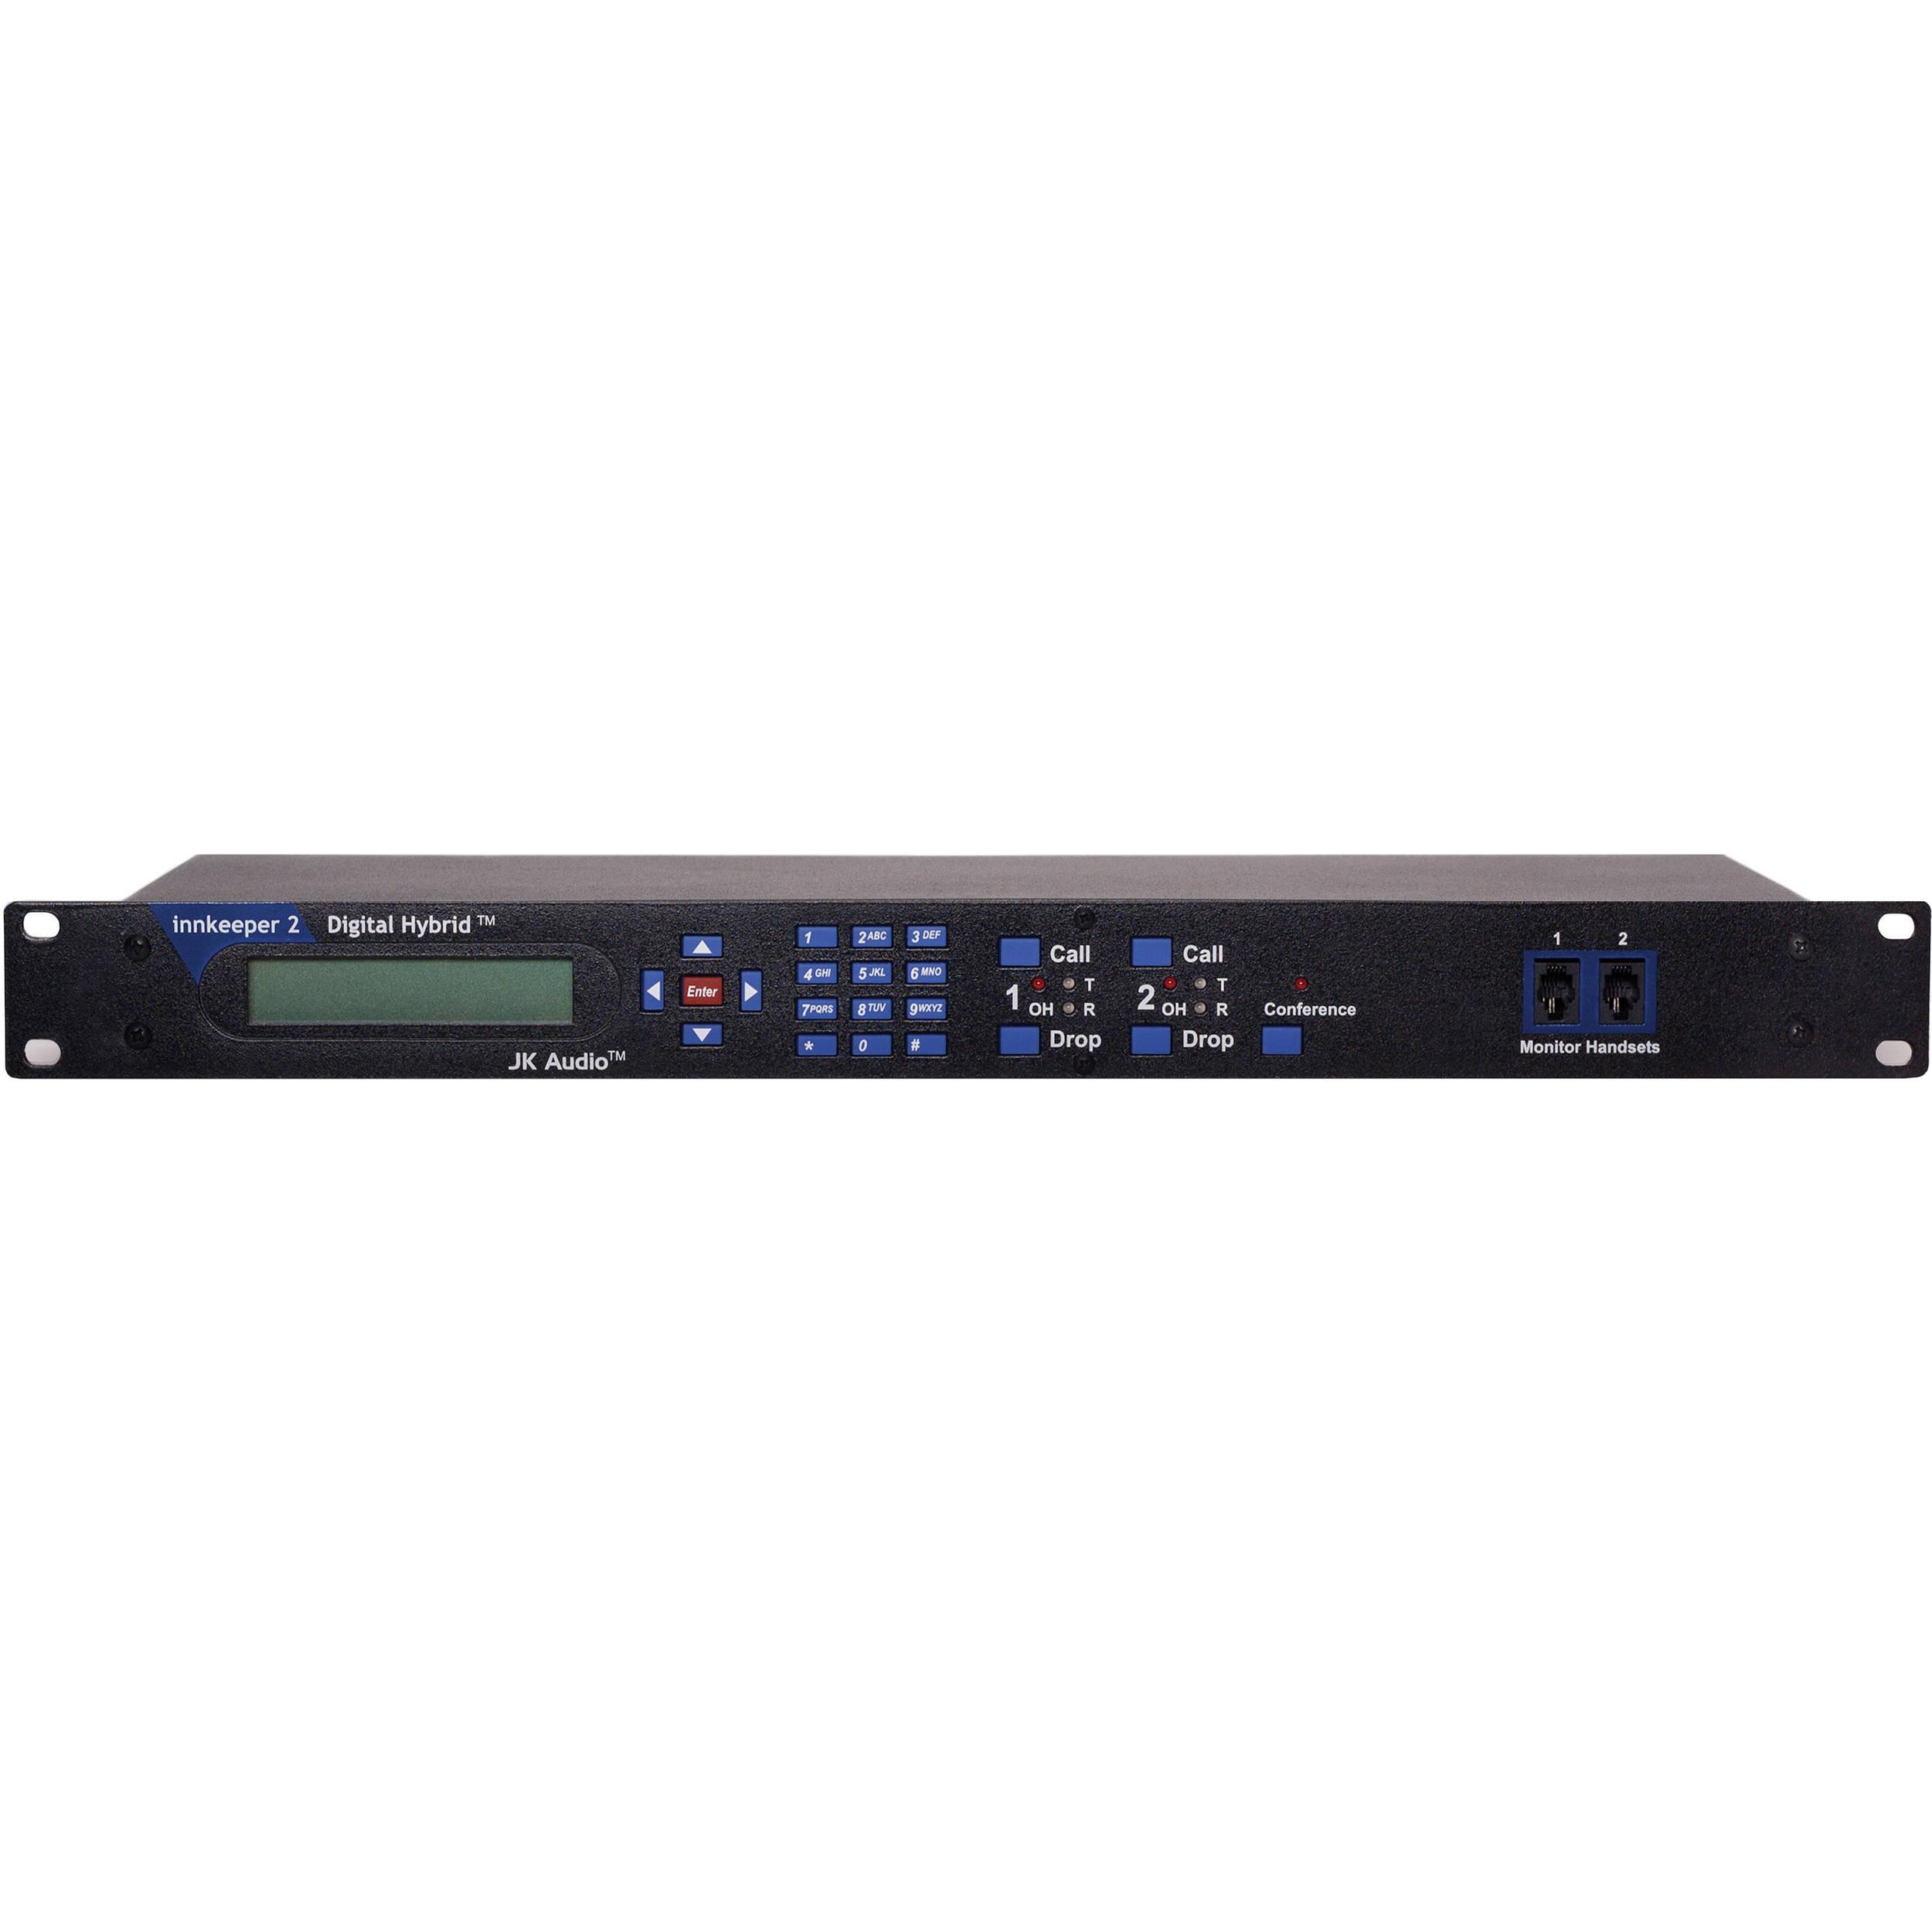 Jk Audio Innkeeper 2 Digital Hybrid Inn2 Bh Photo Video Telephone Circuit